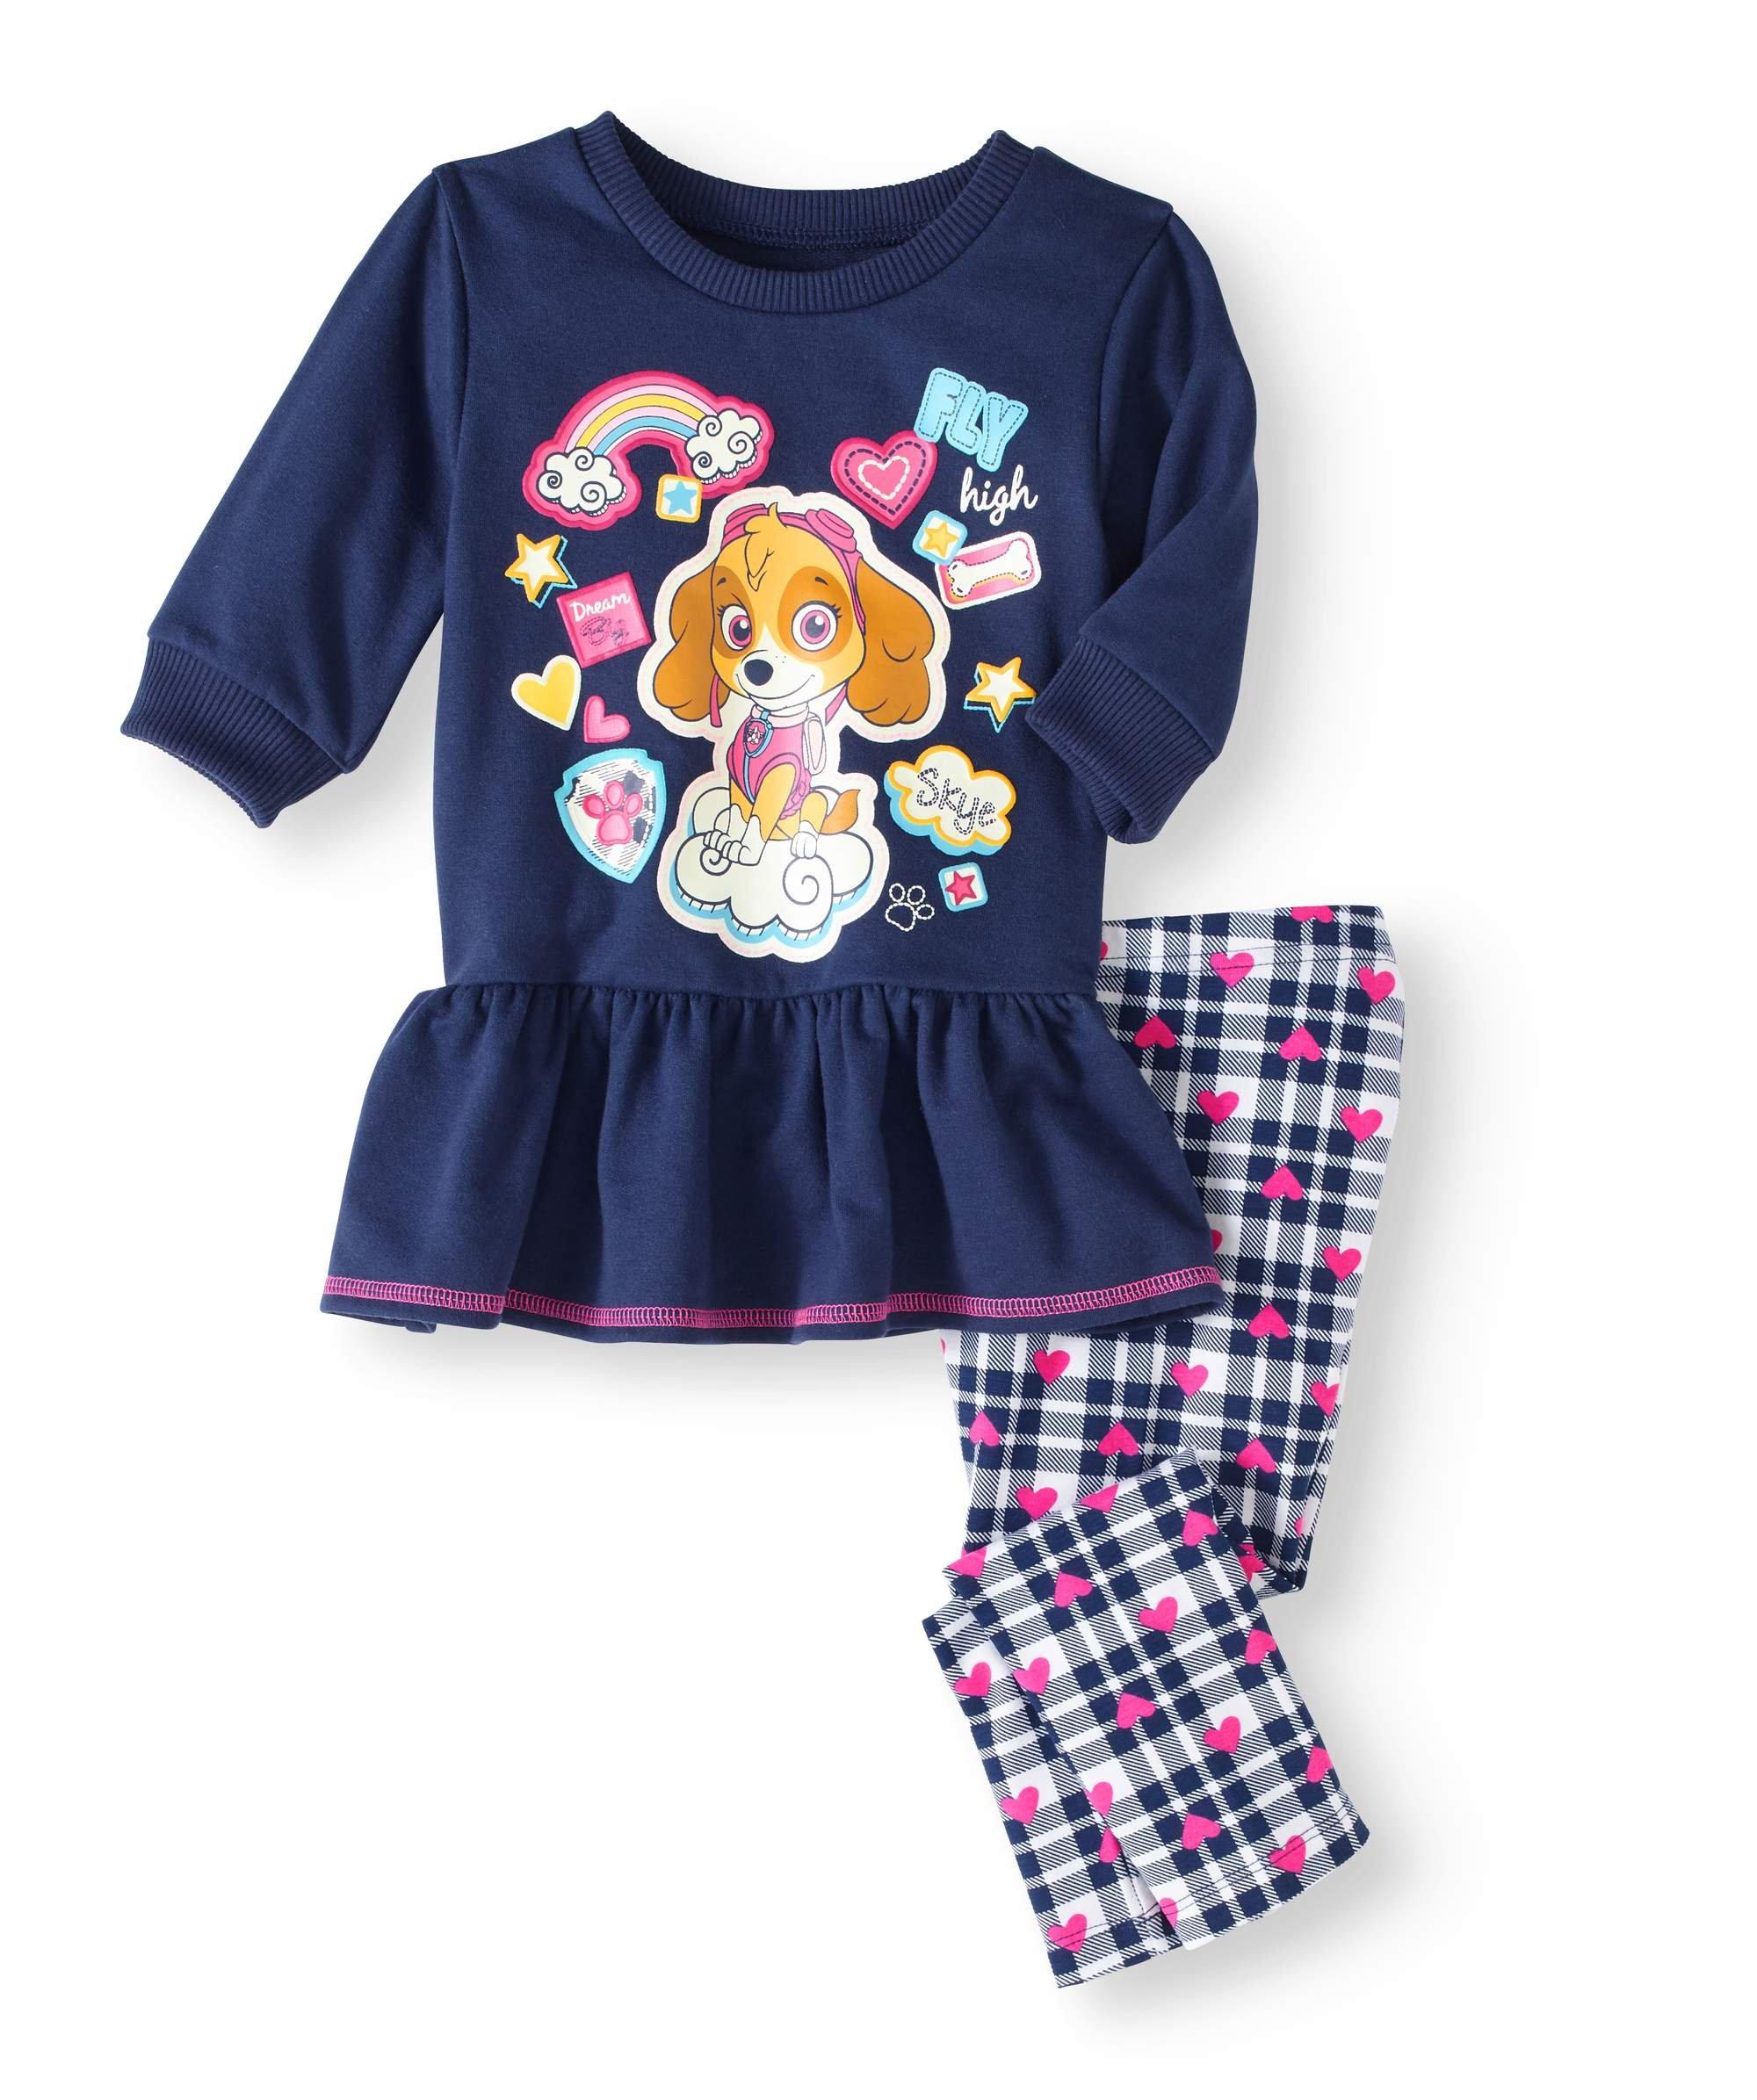 Paw Patrol Skye Toddler Little Girls Tunic & Leggings Outfit Set (2T)